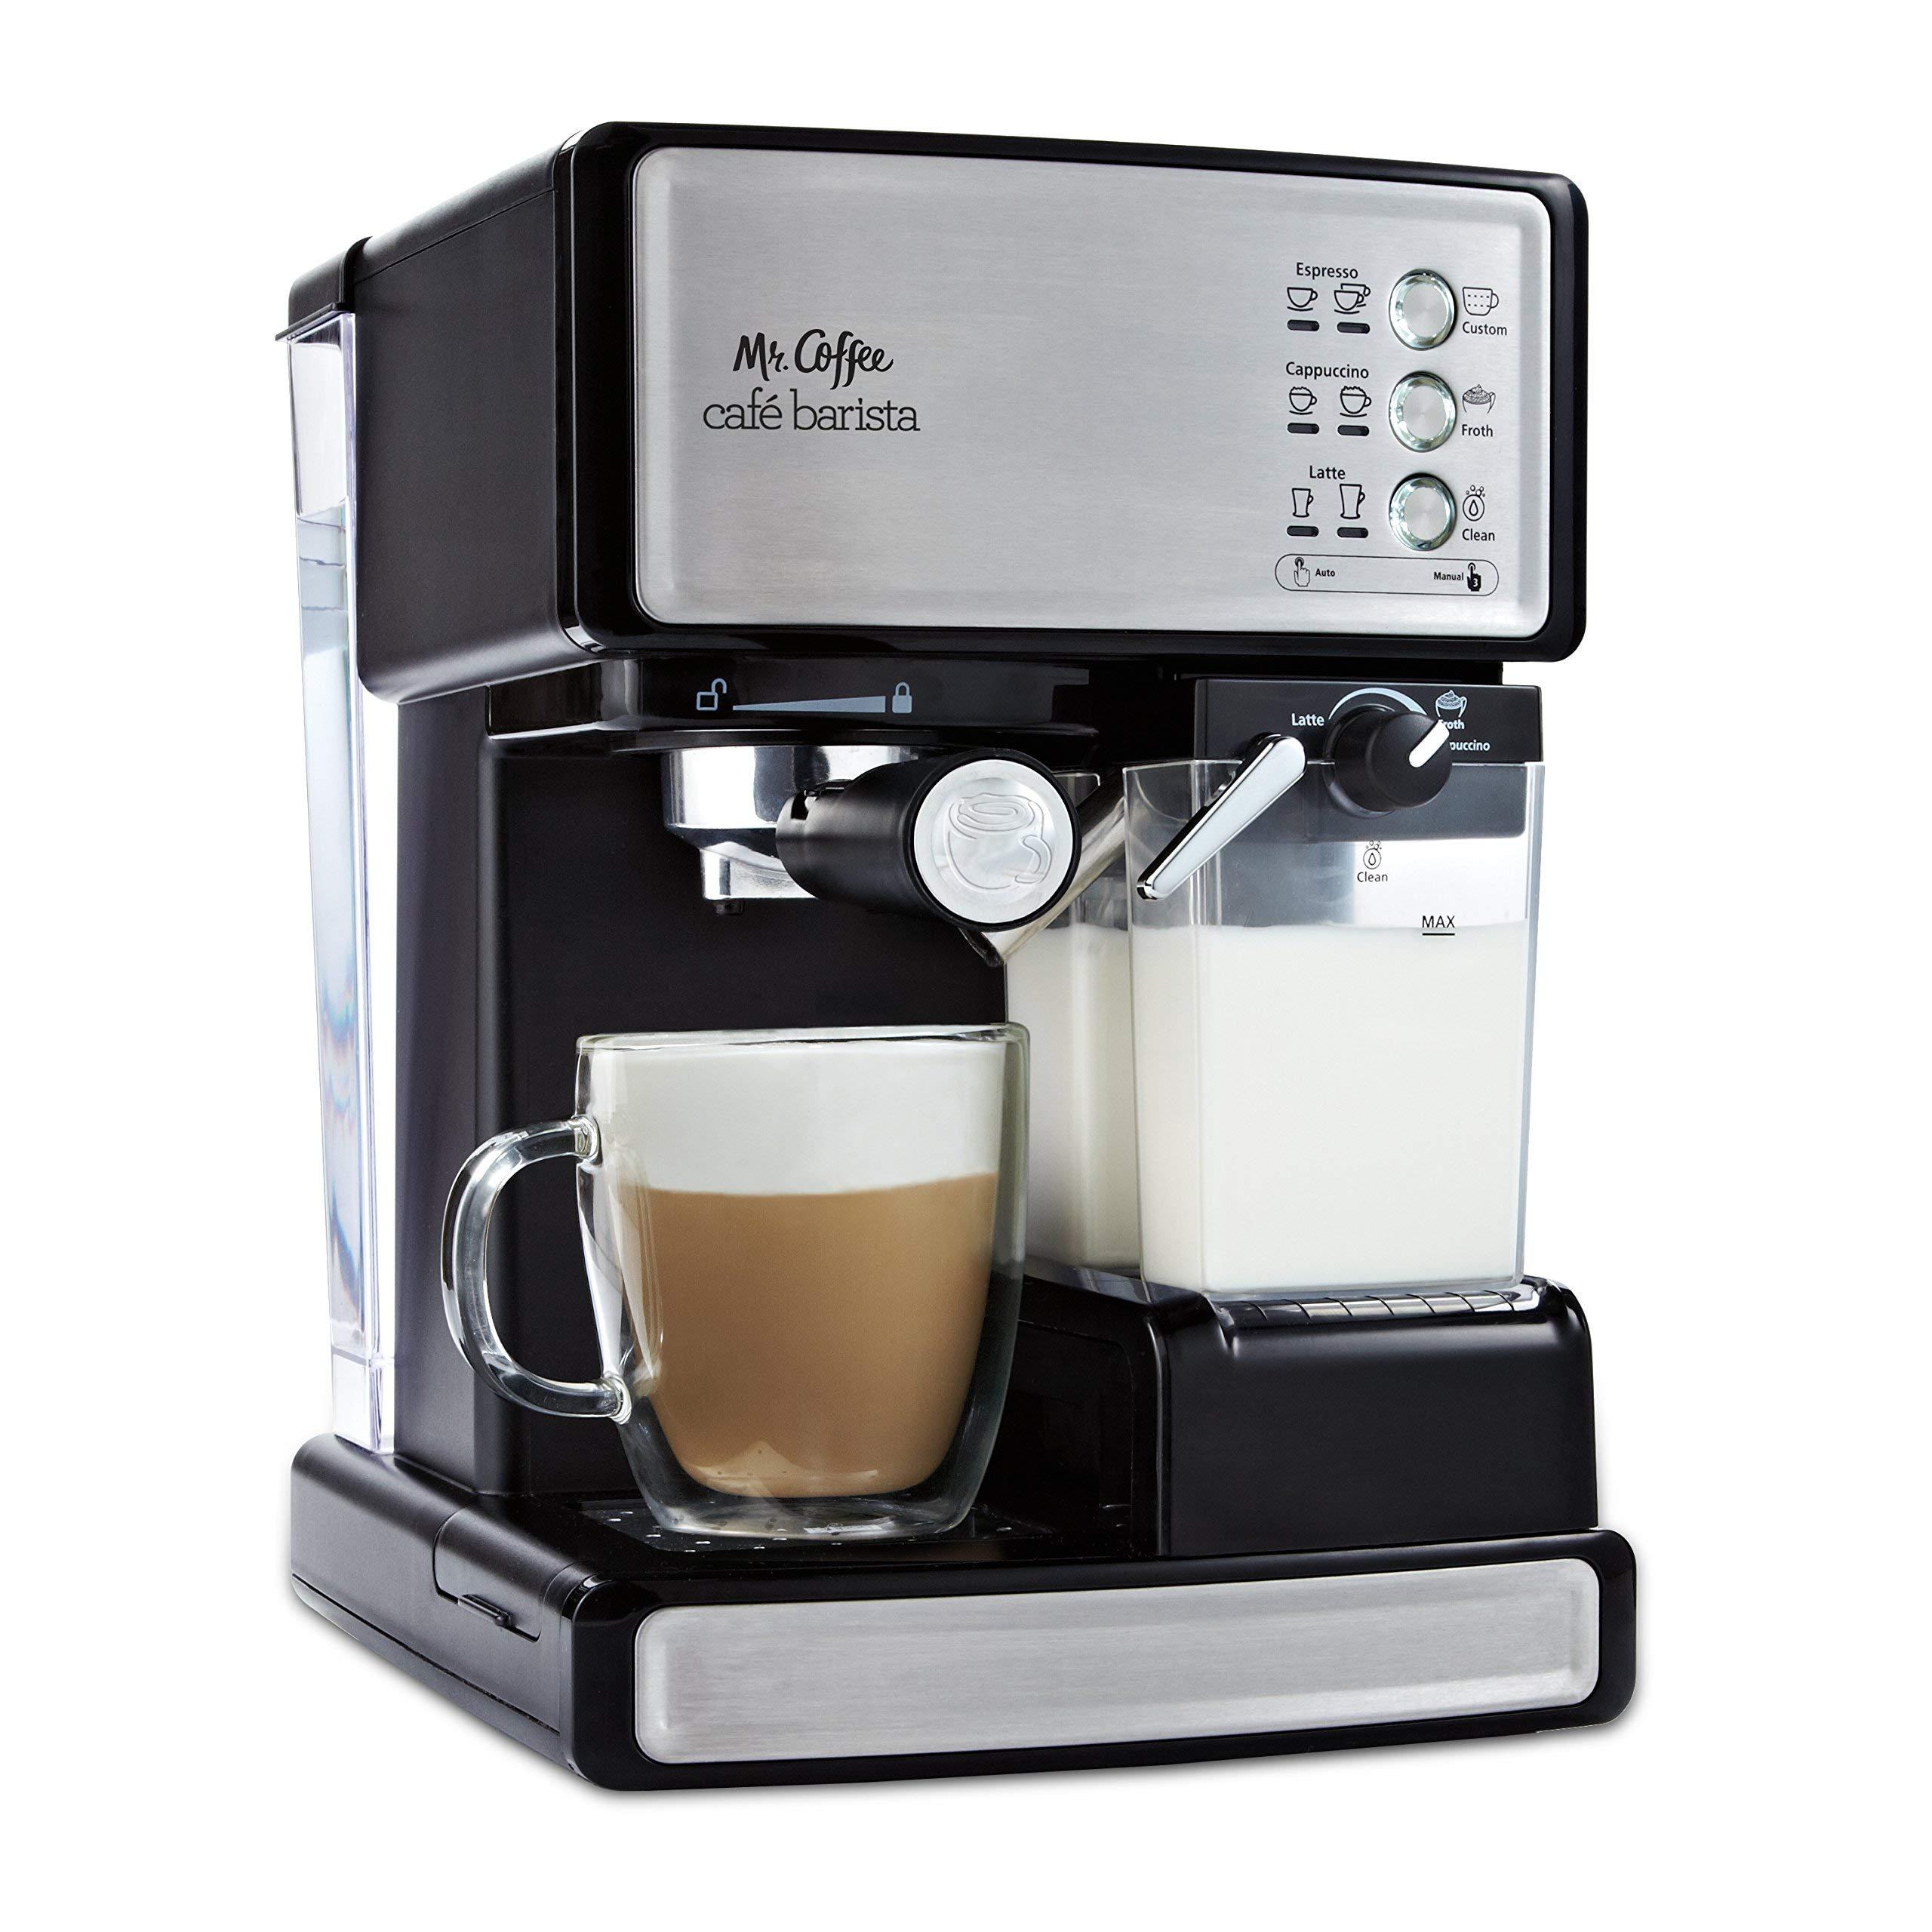 Mr. Coffee Cafe Barista Espresso and Cappuccino Maker, Silver (Renewed) by Mr. Coffee